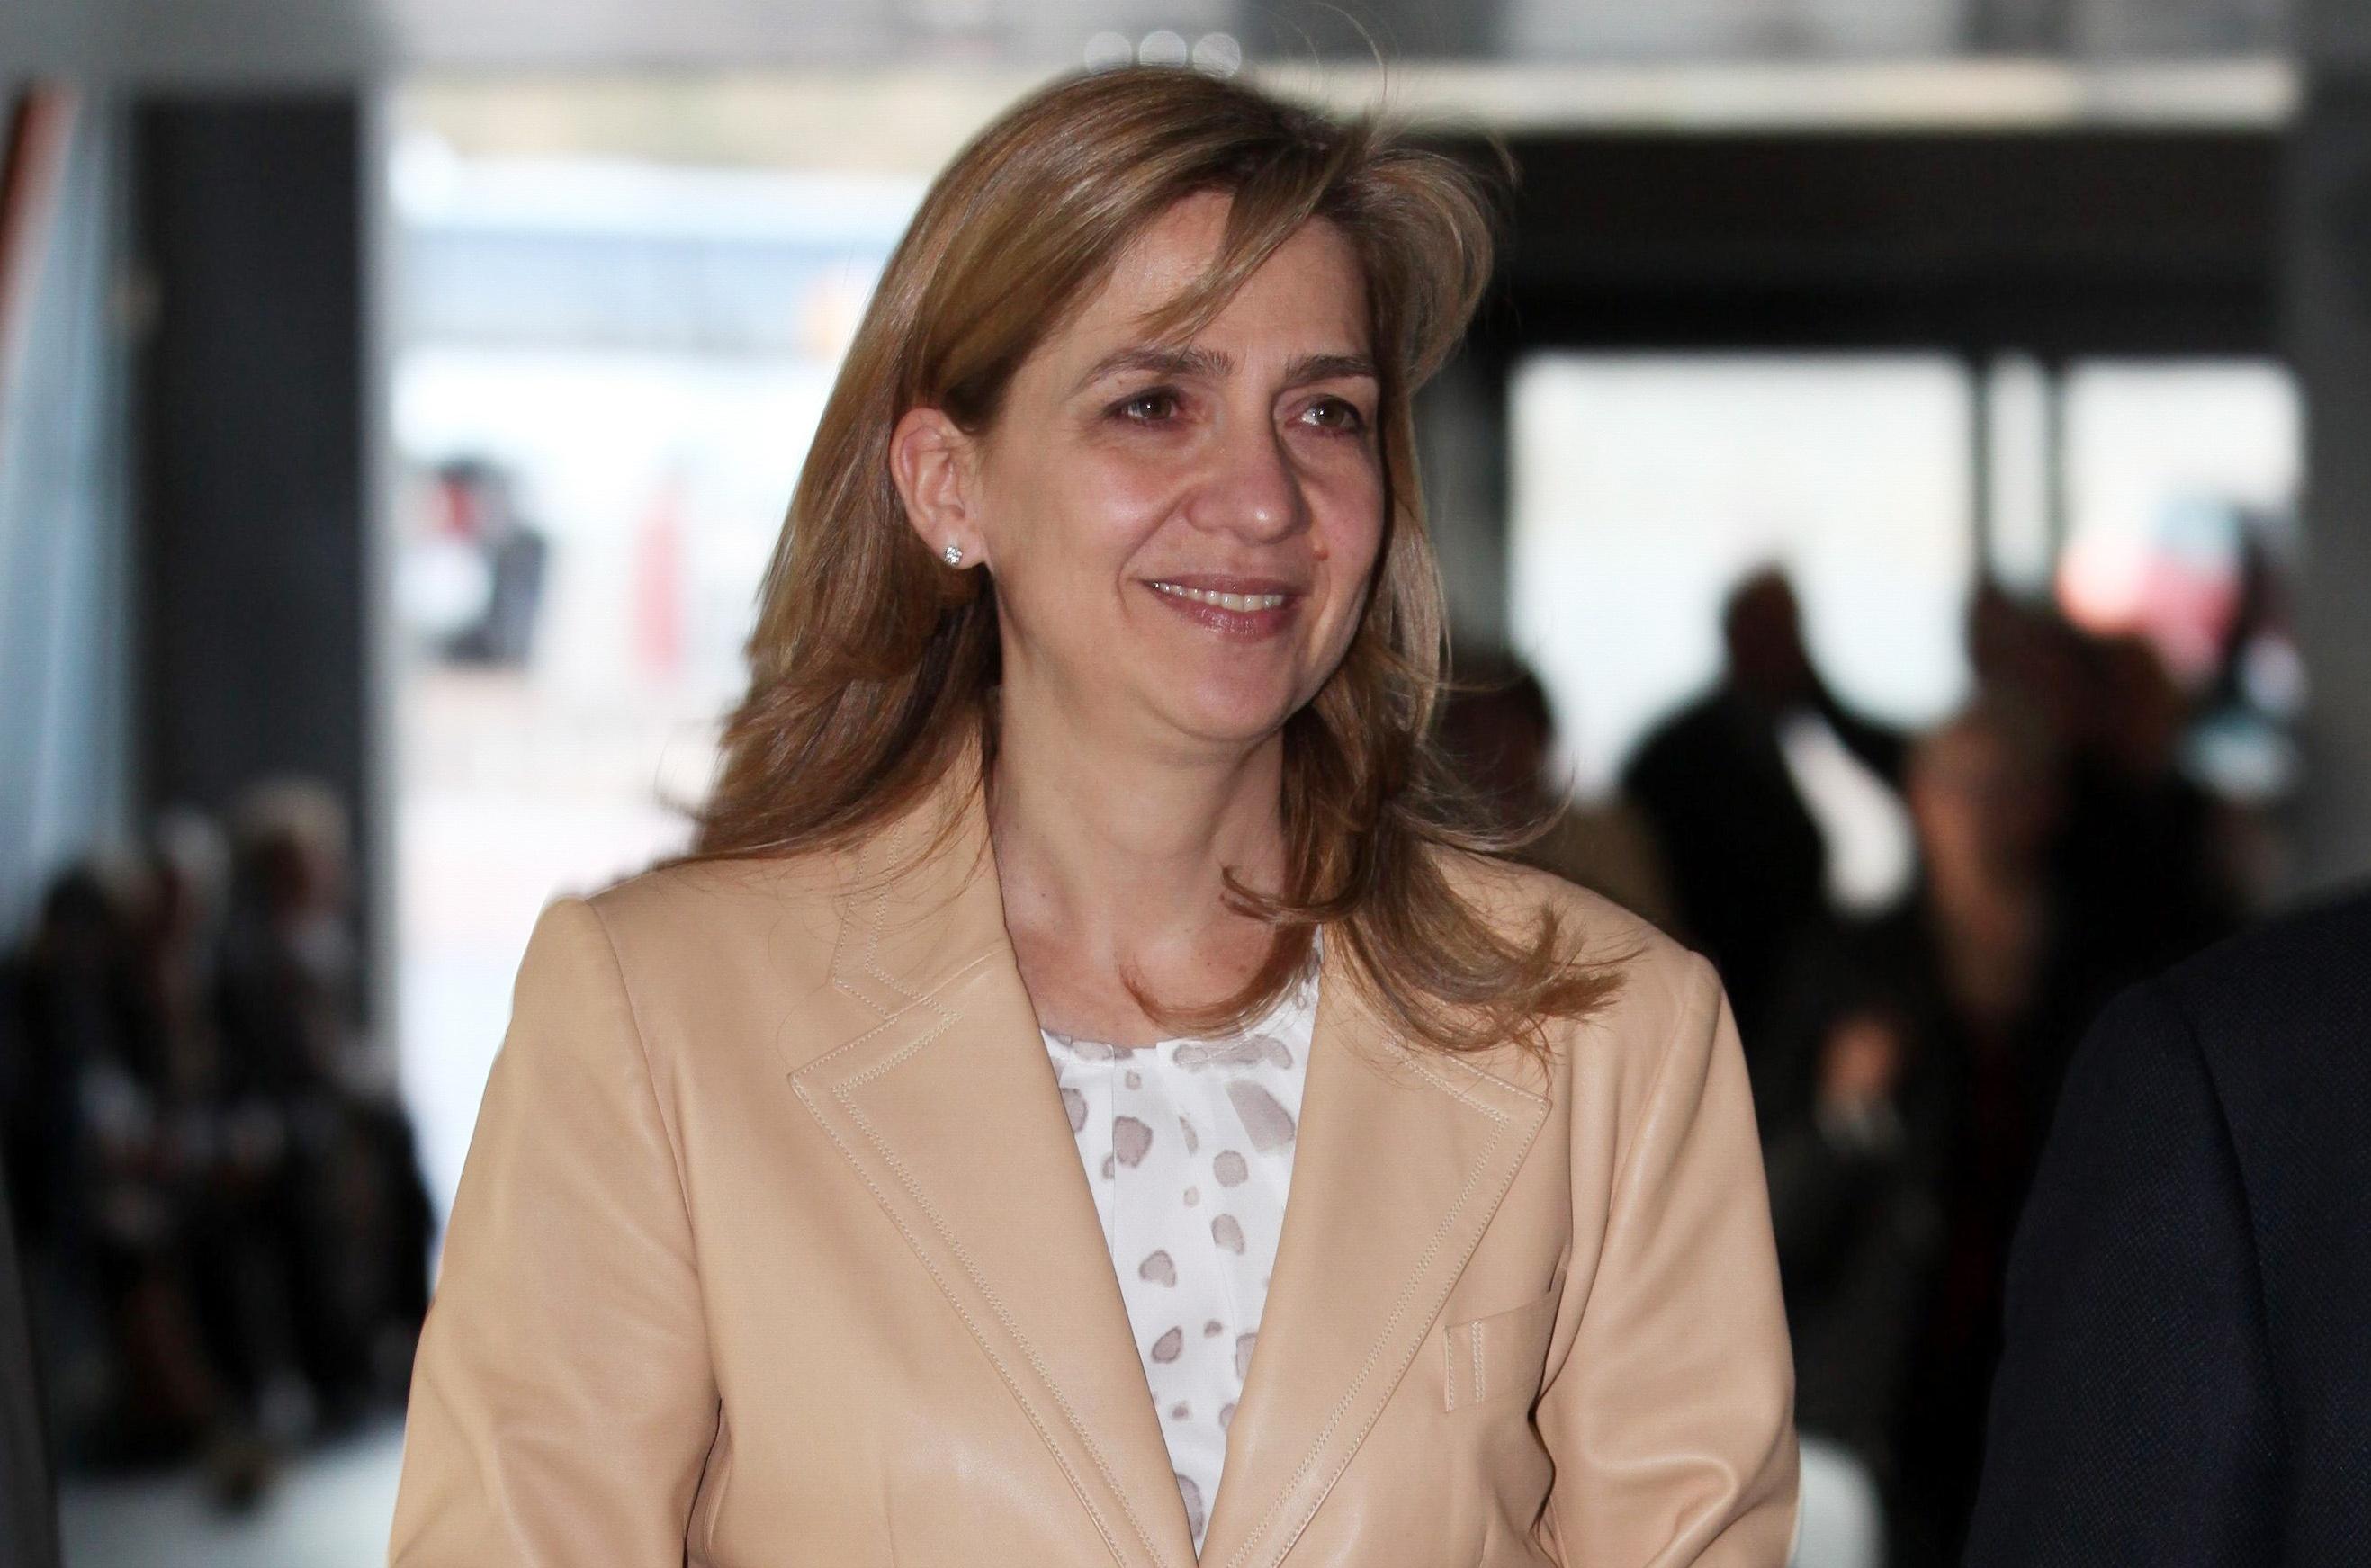 La infanta Cristina pasó de ingresar 162.300 euros en 2008 a 311.169 un año después